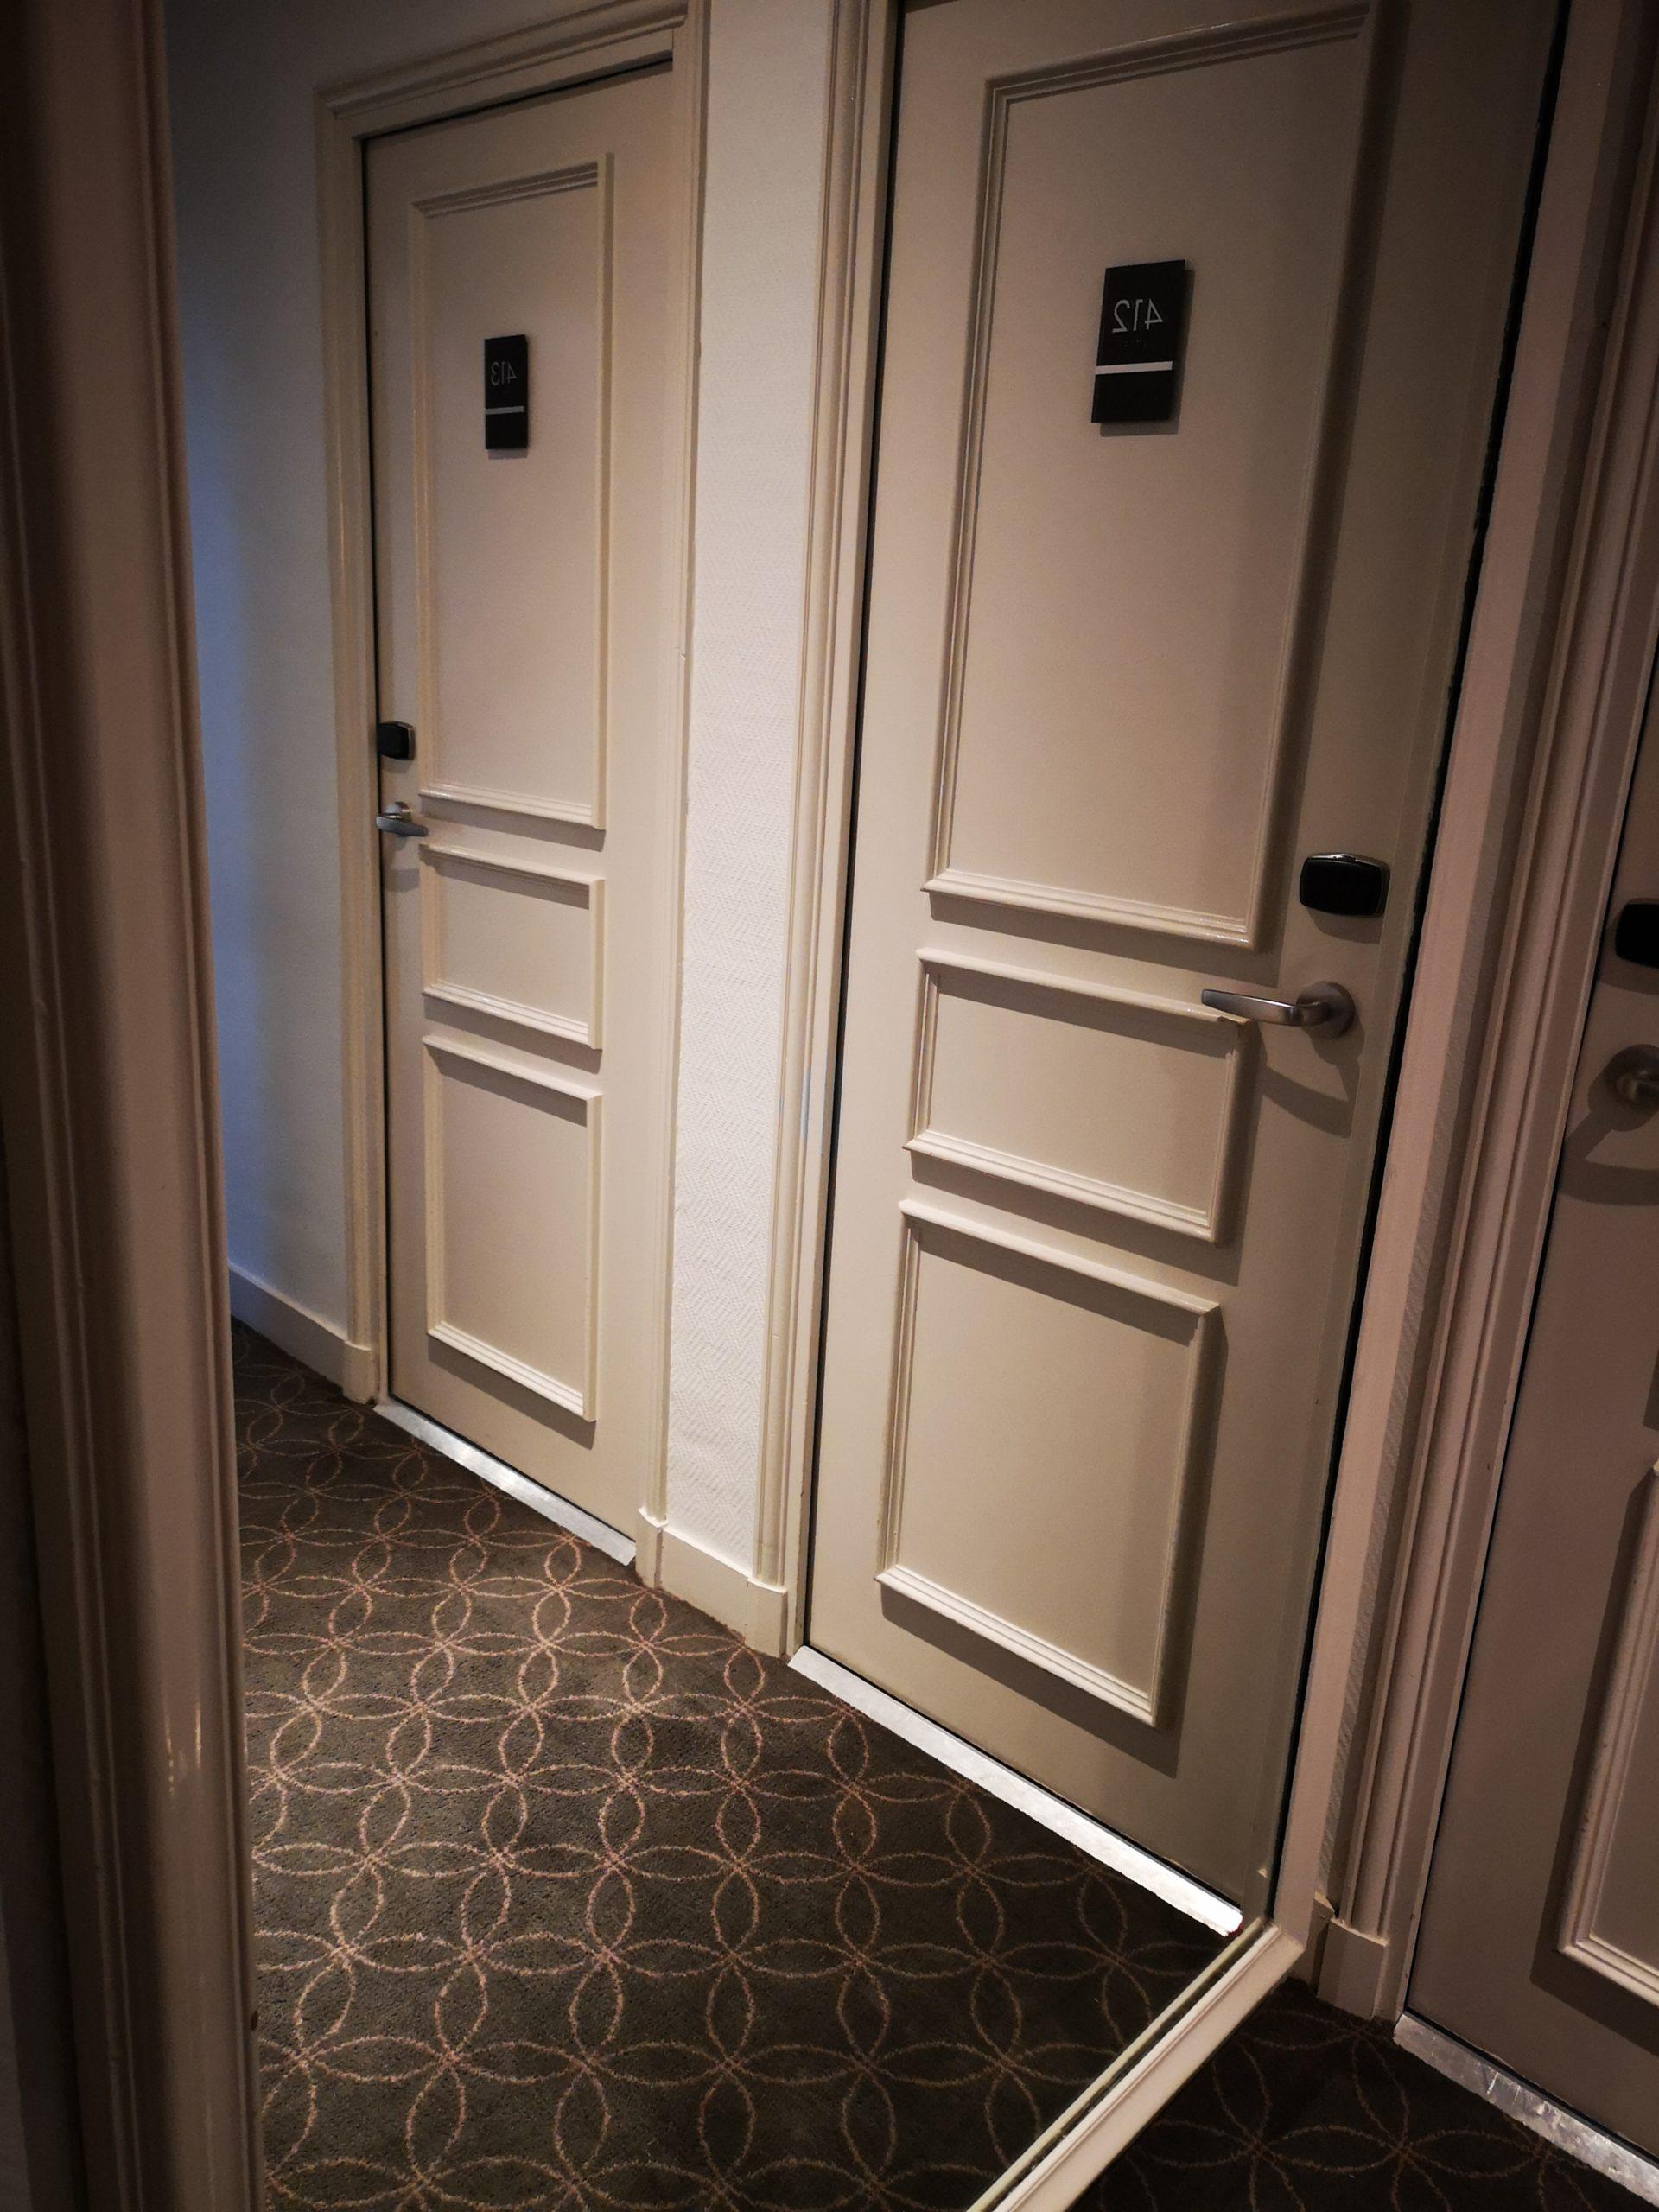 Couloir - hôtel magda champs-élysées